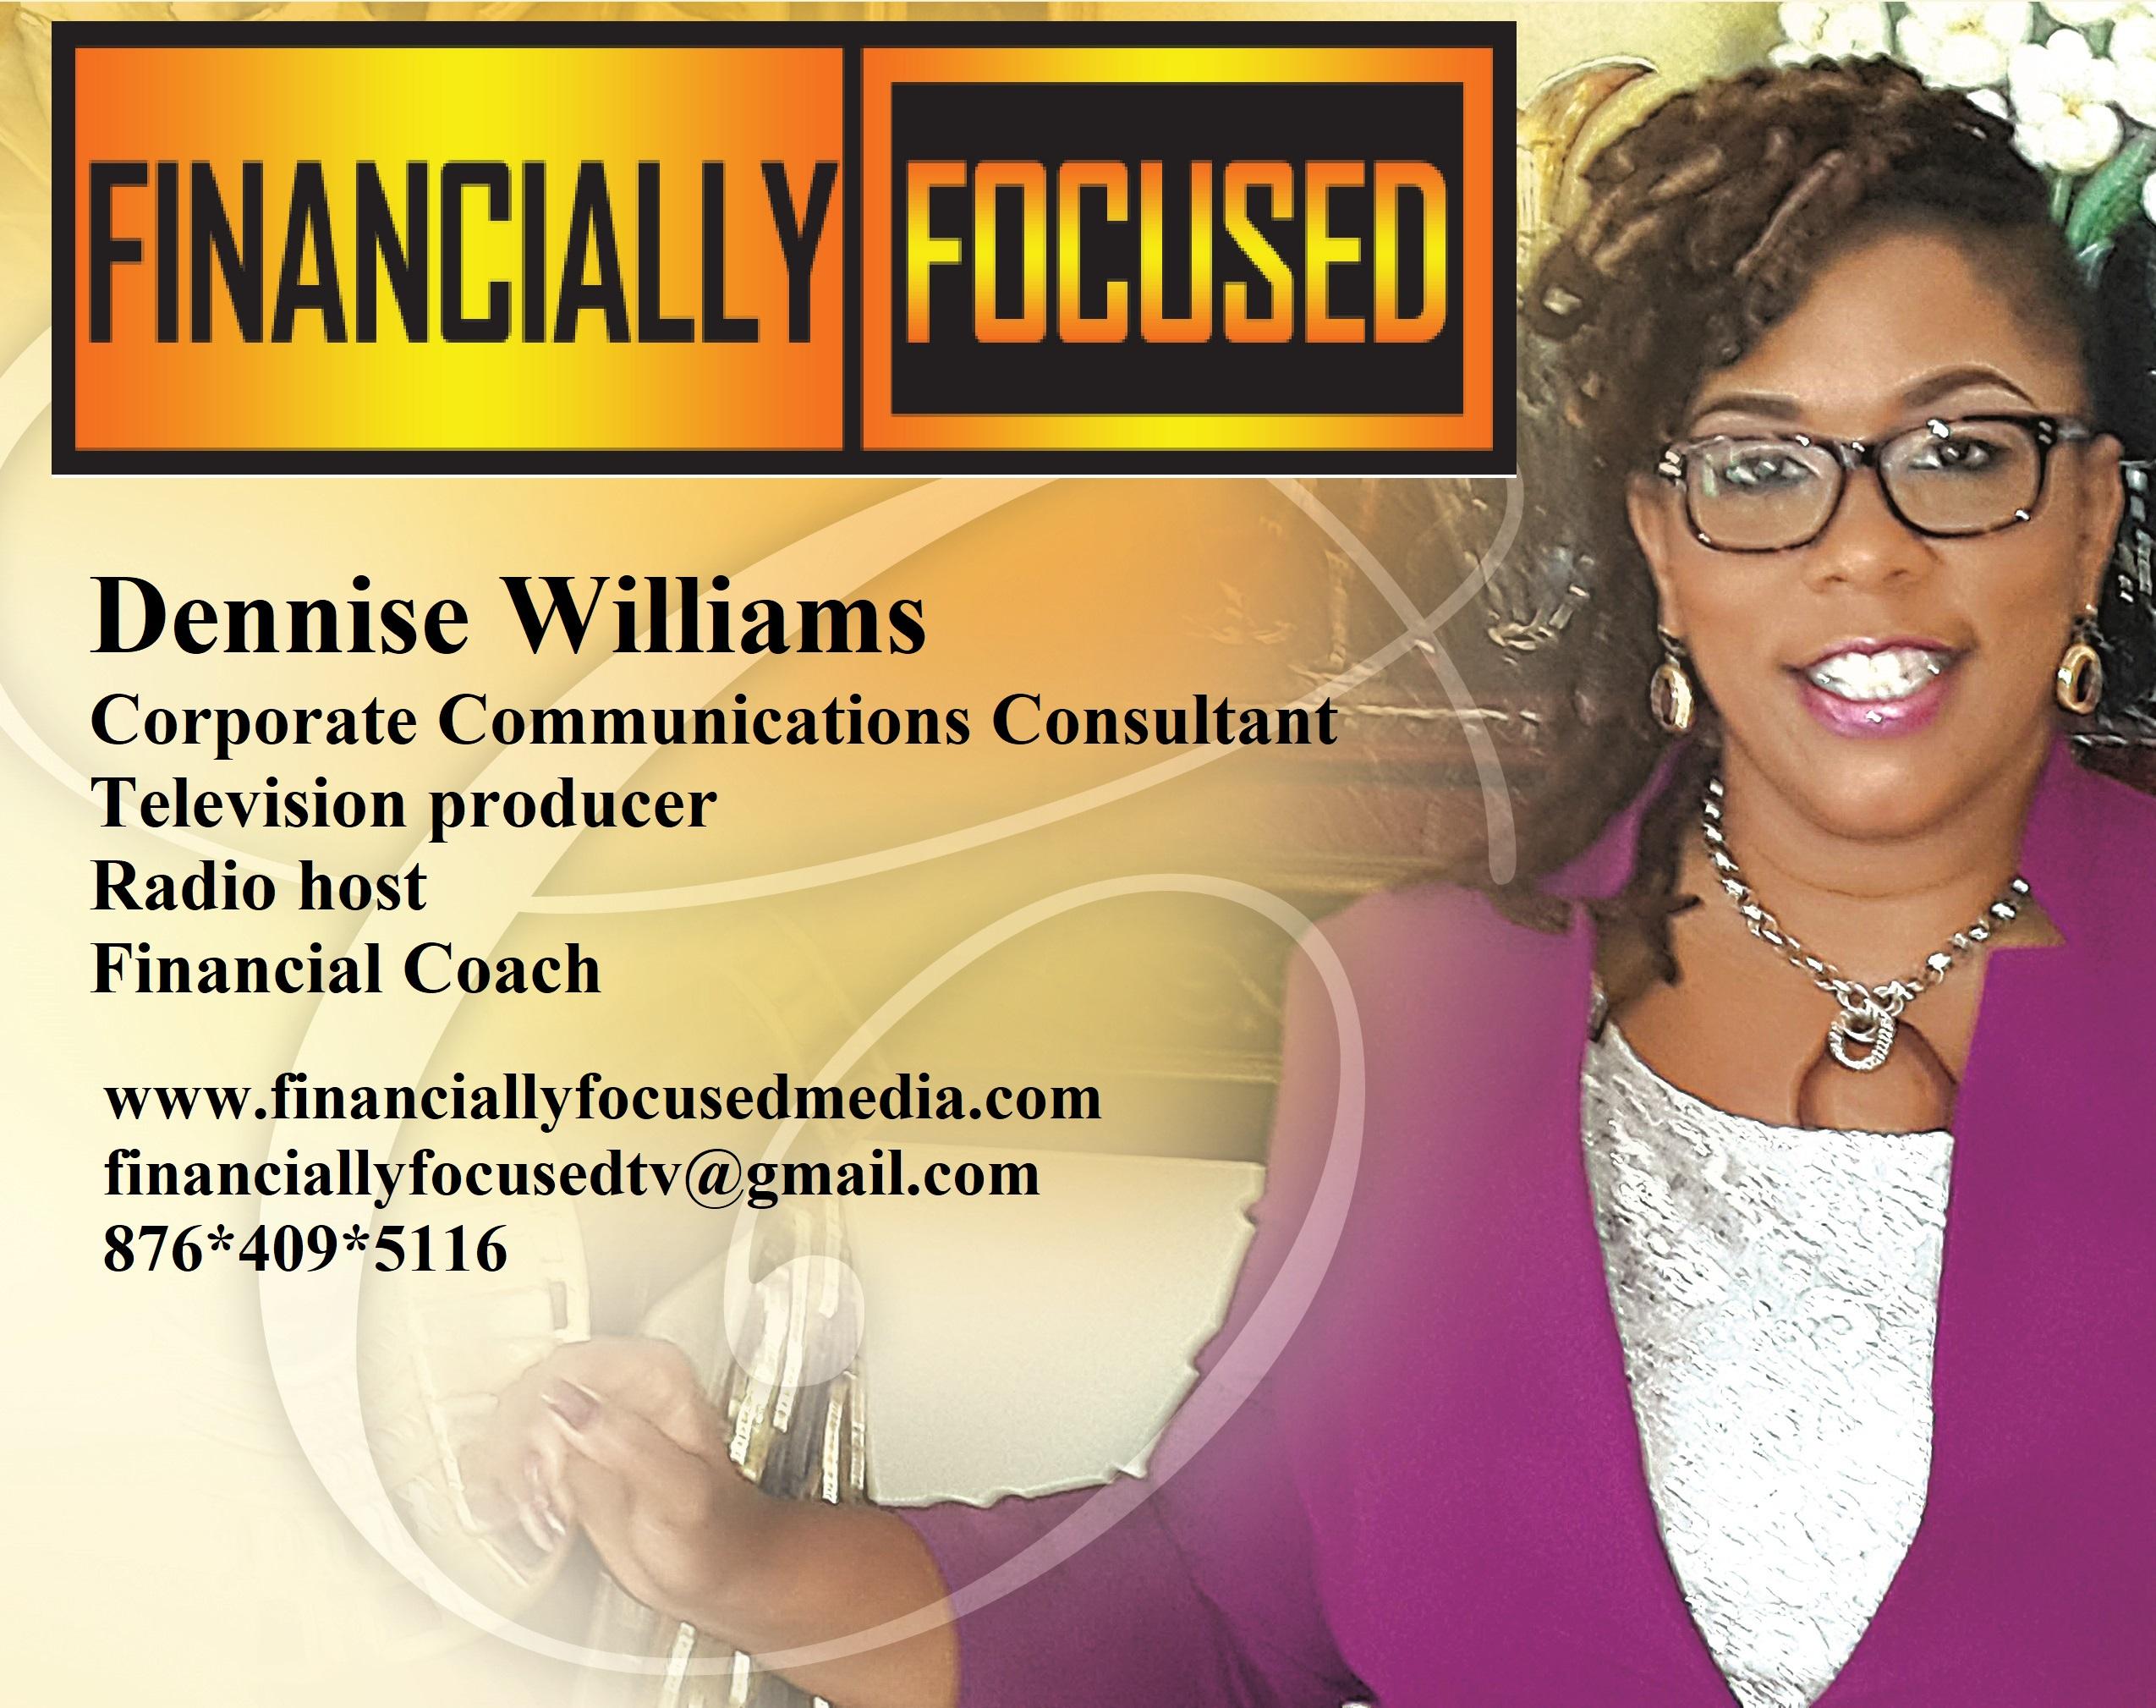 Sample of financial writing